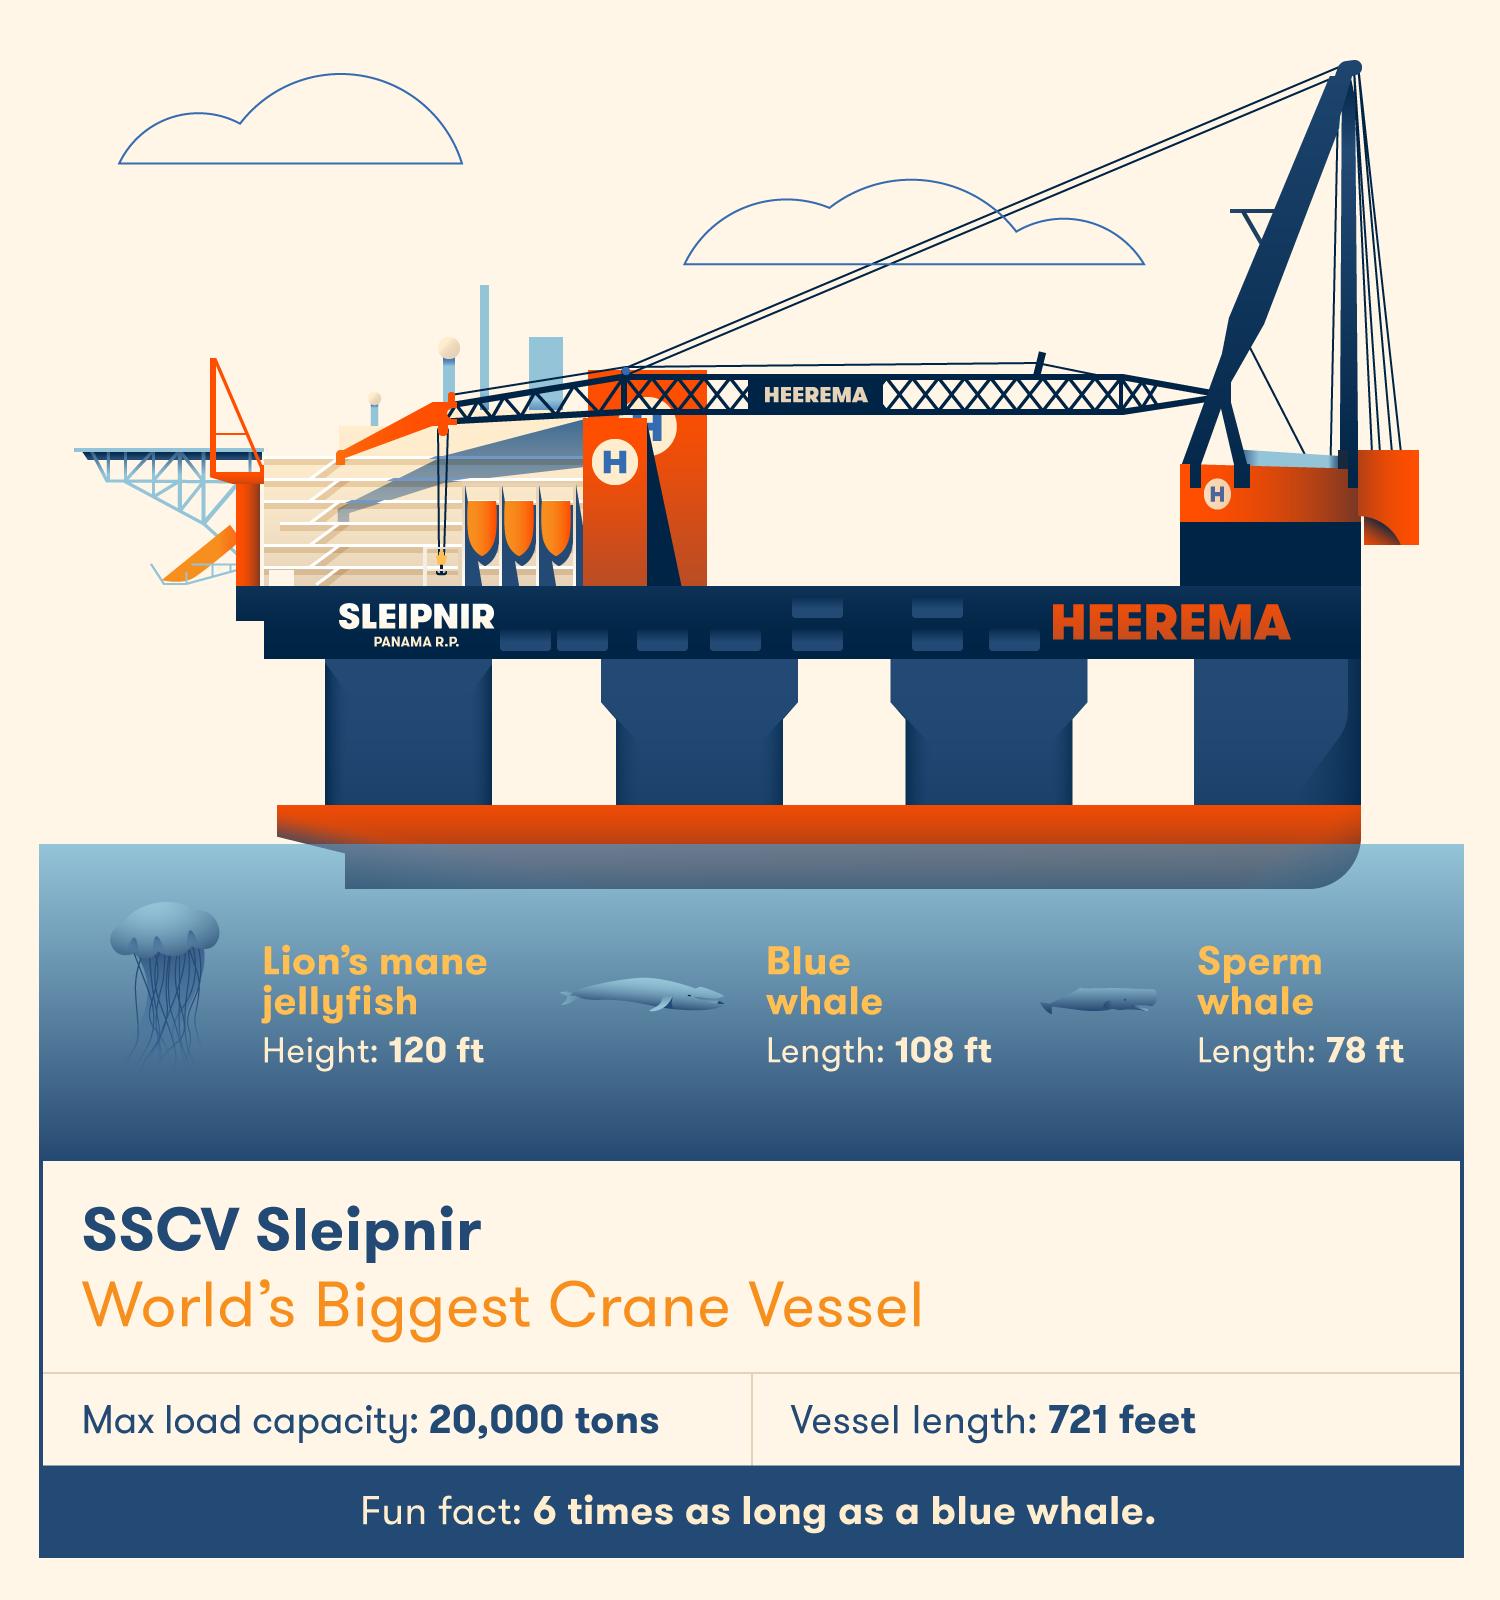 The SSCV Sleipnir is the world's strongest crane vessel.